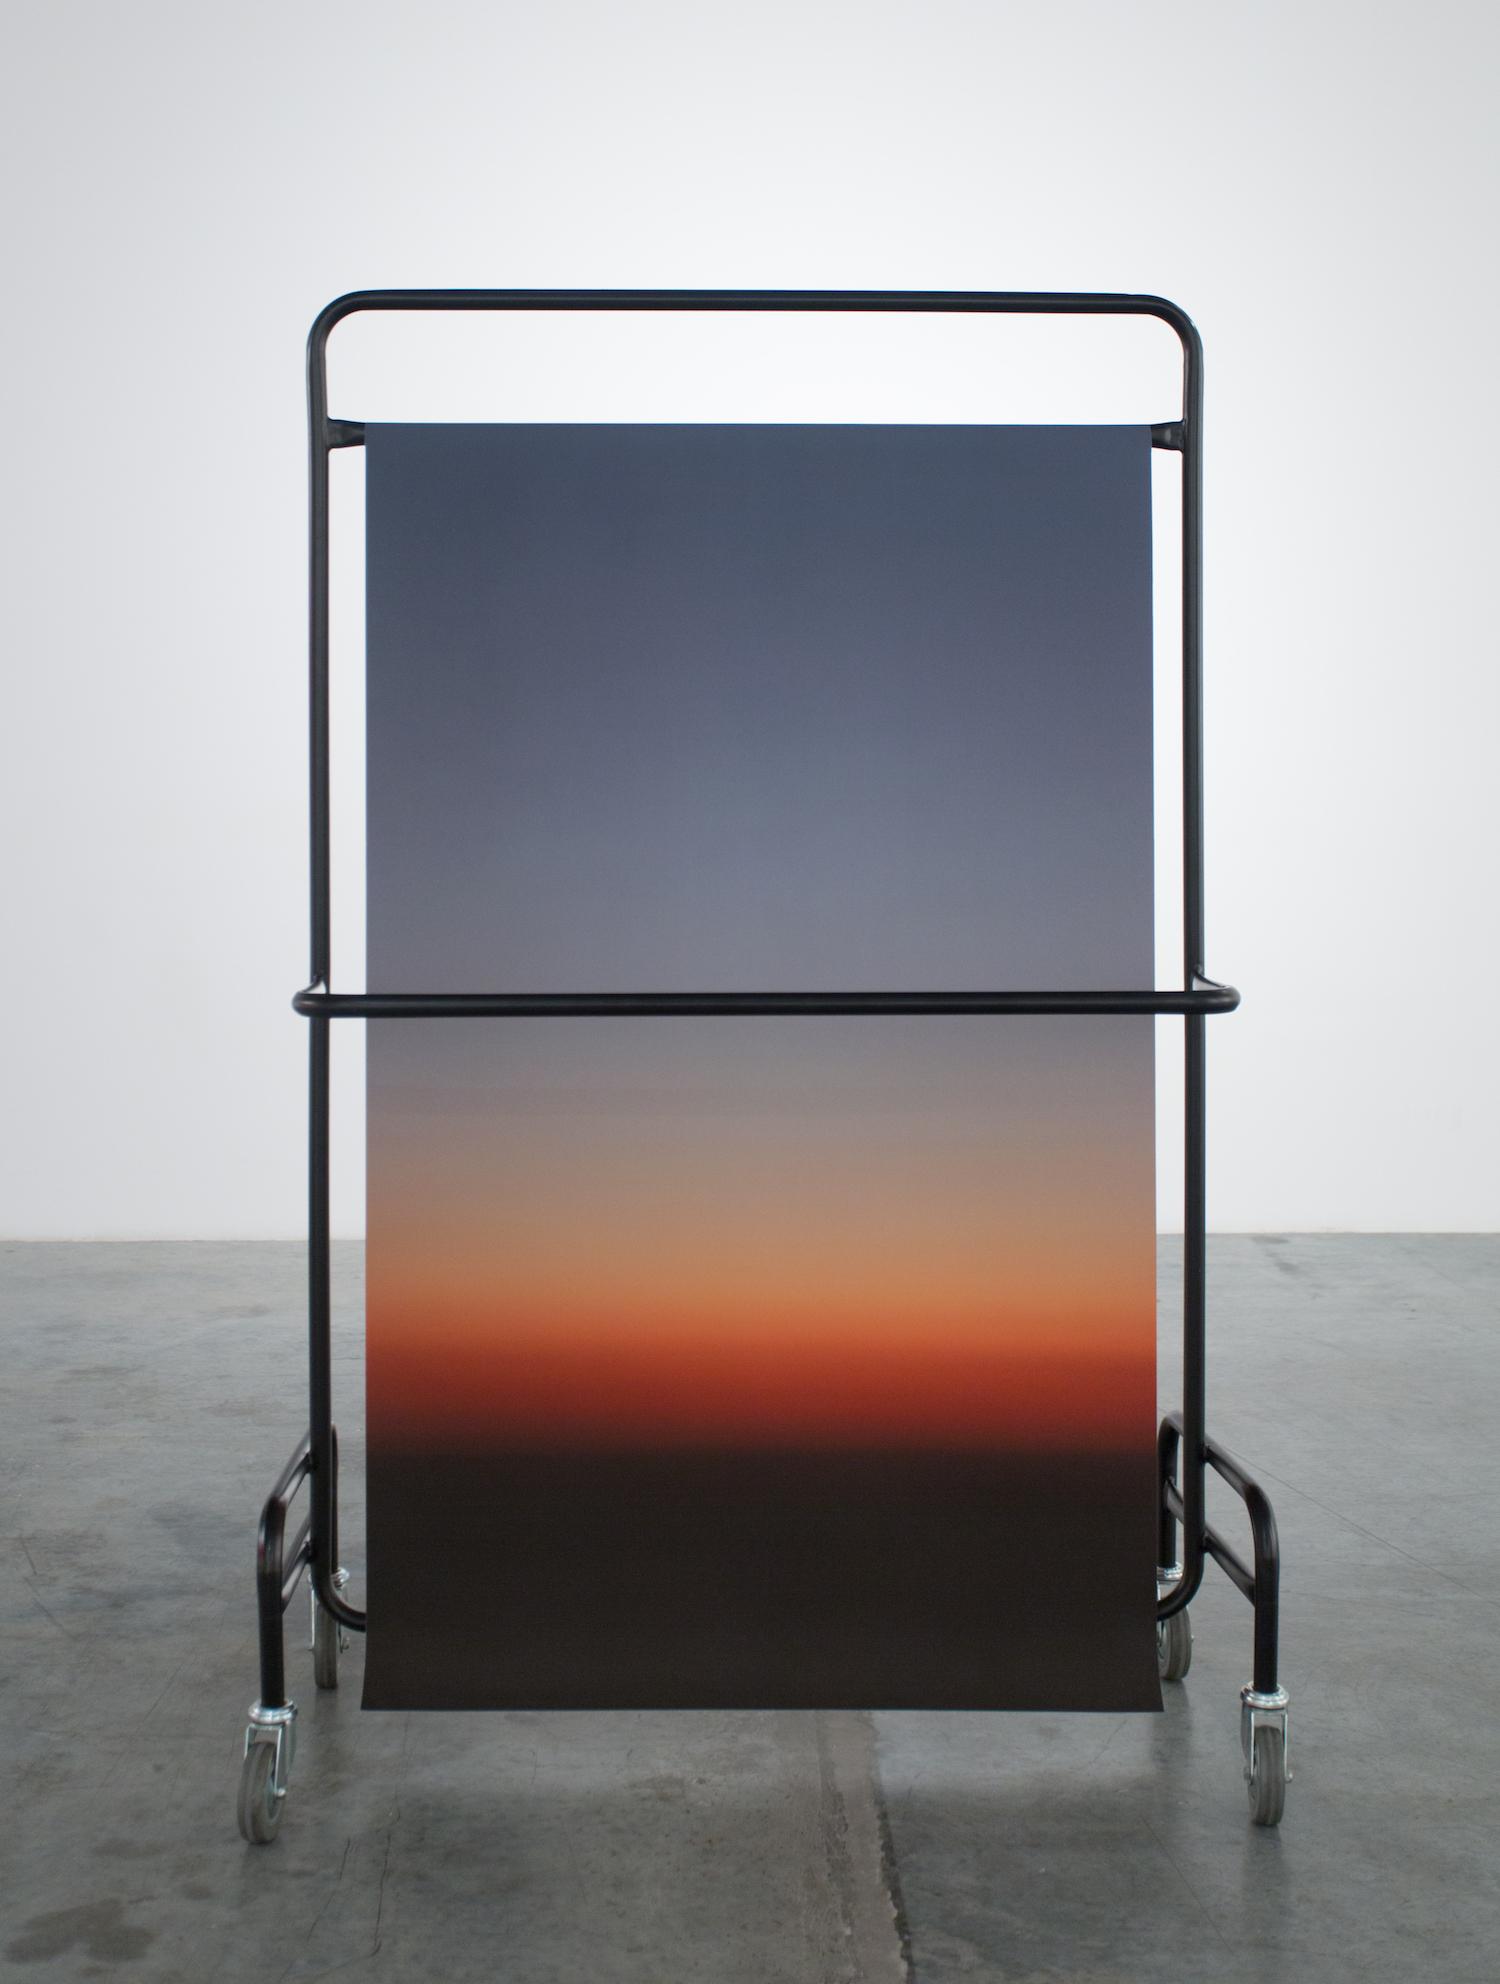 Stéphanie Saadé  Structure 3 (Suspended Horizon) 2012 Mixed media – Chrome structure, Photograph (300 x 90 cm) 170 x 100 x 150 cm Edition 1/2